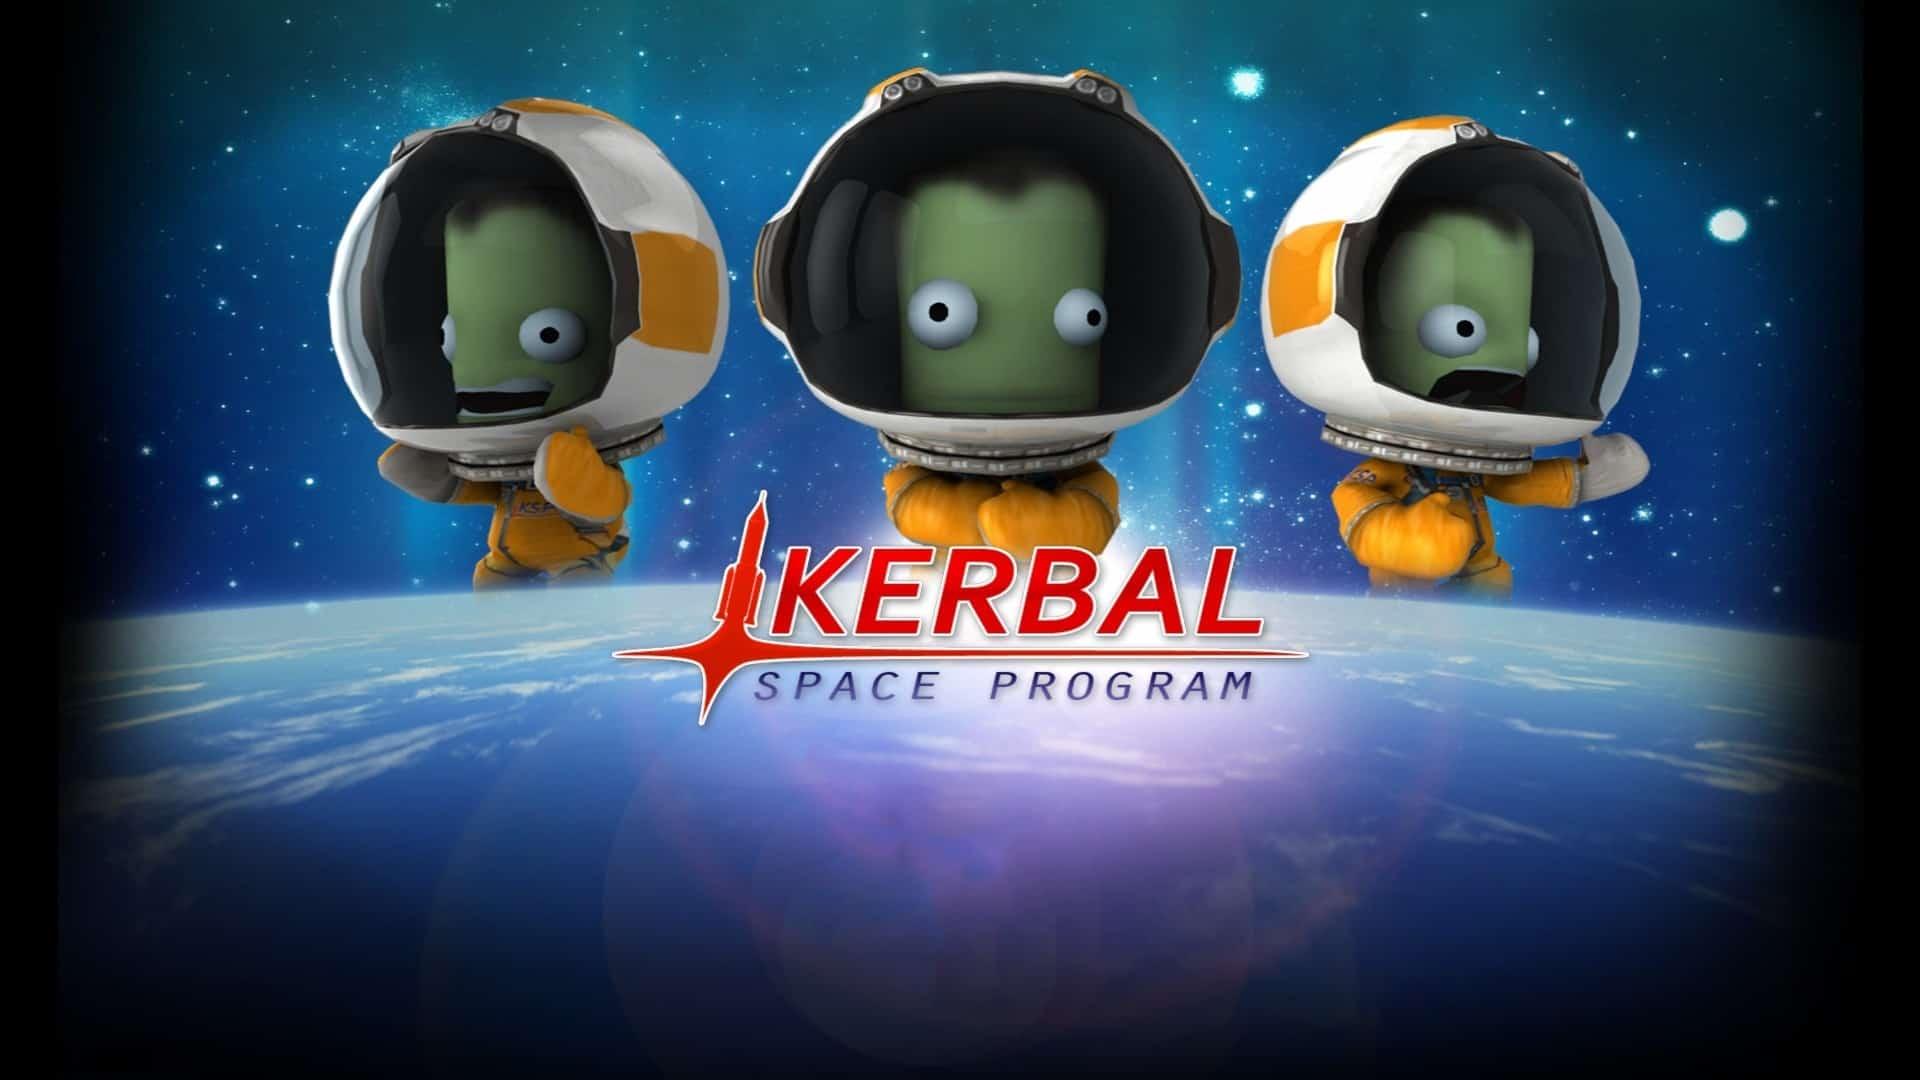 Kerbal Space Program immagine in evidenza